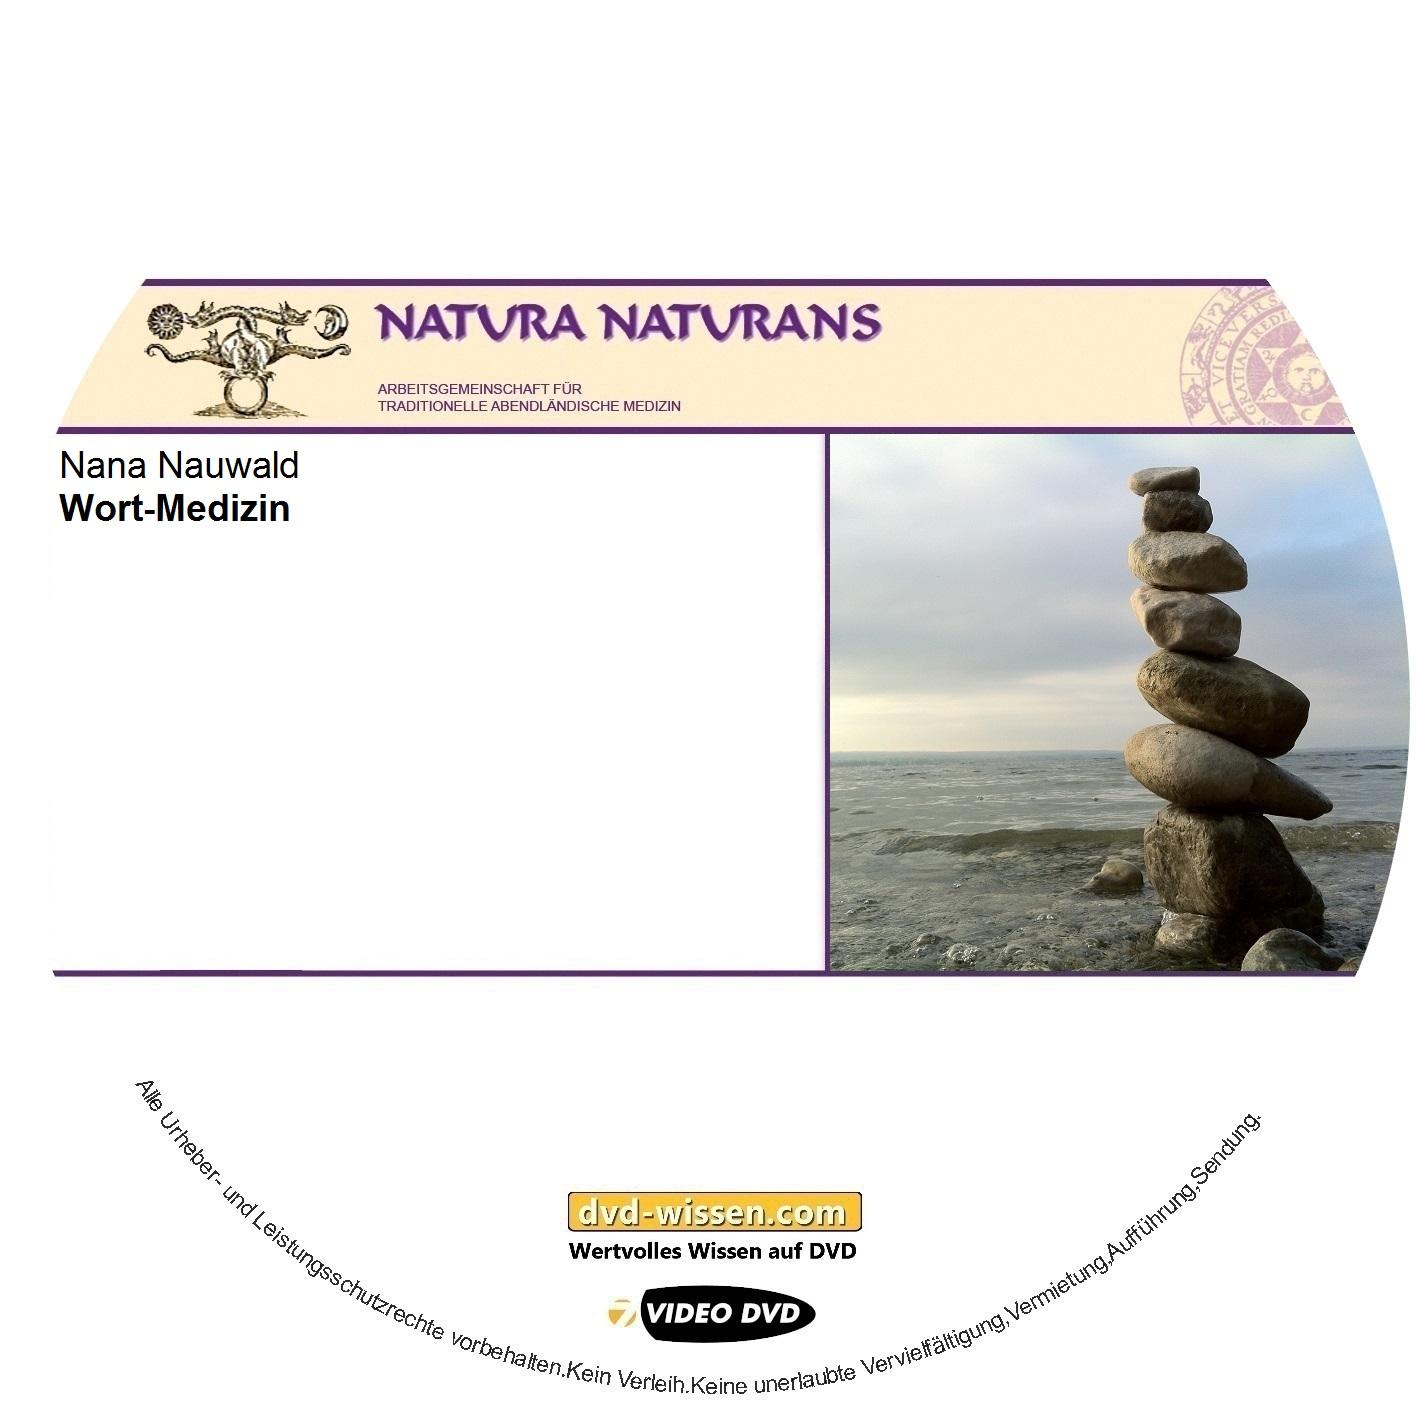 Nana Nauwald: Wort-Medizin